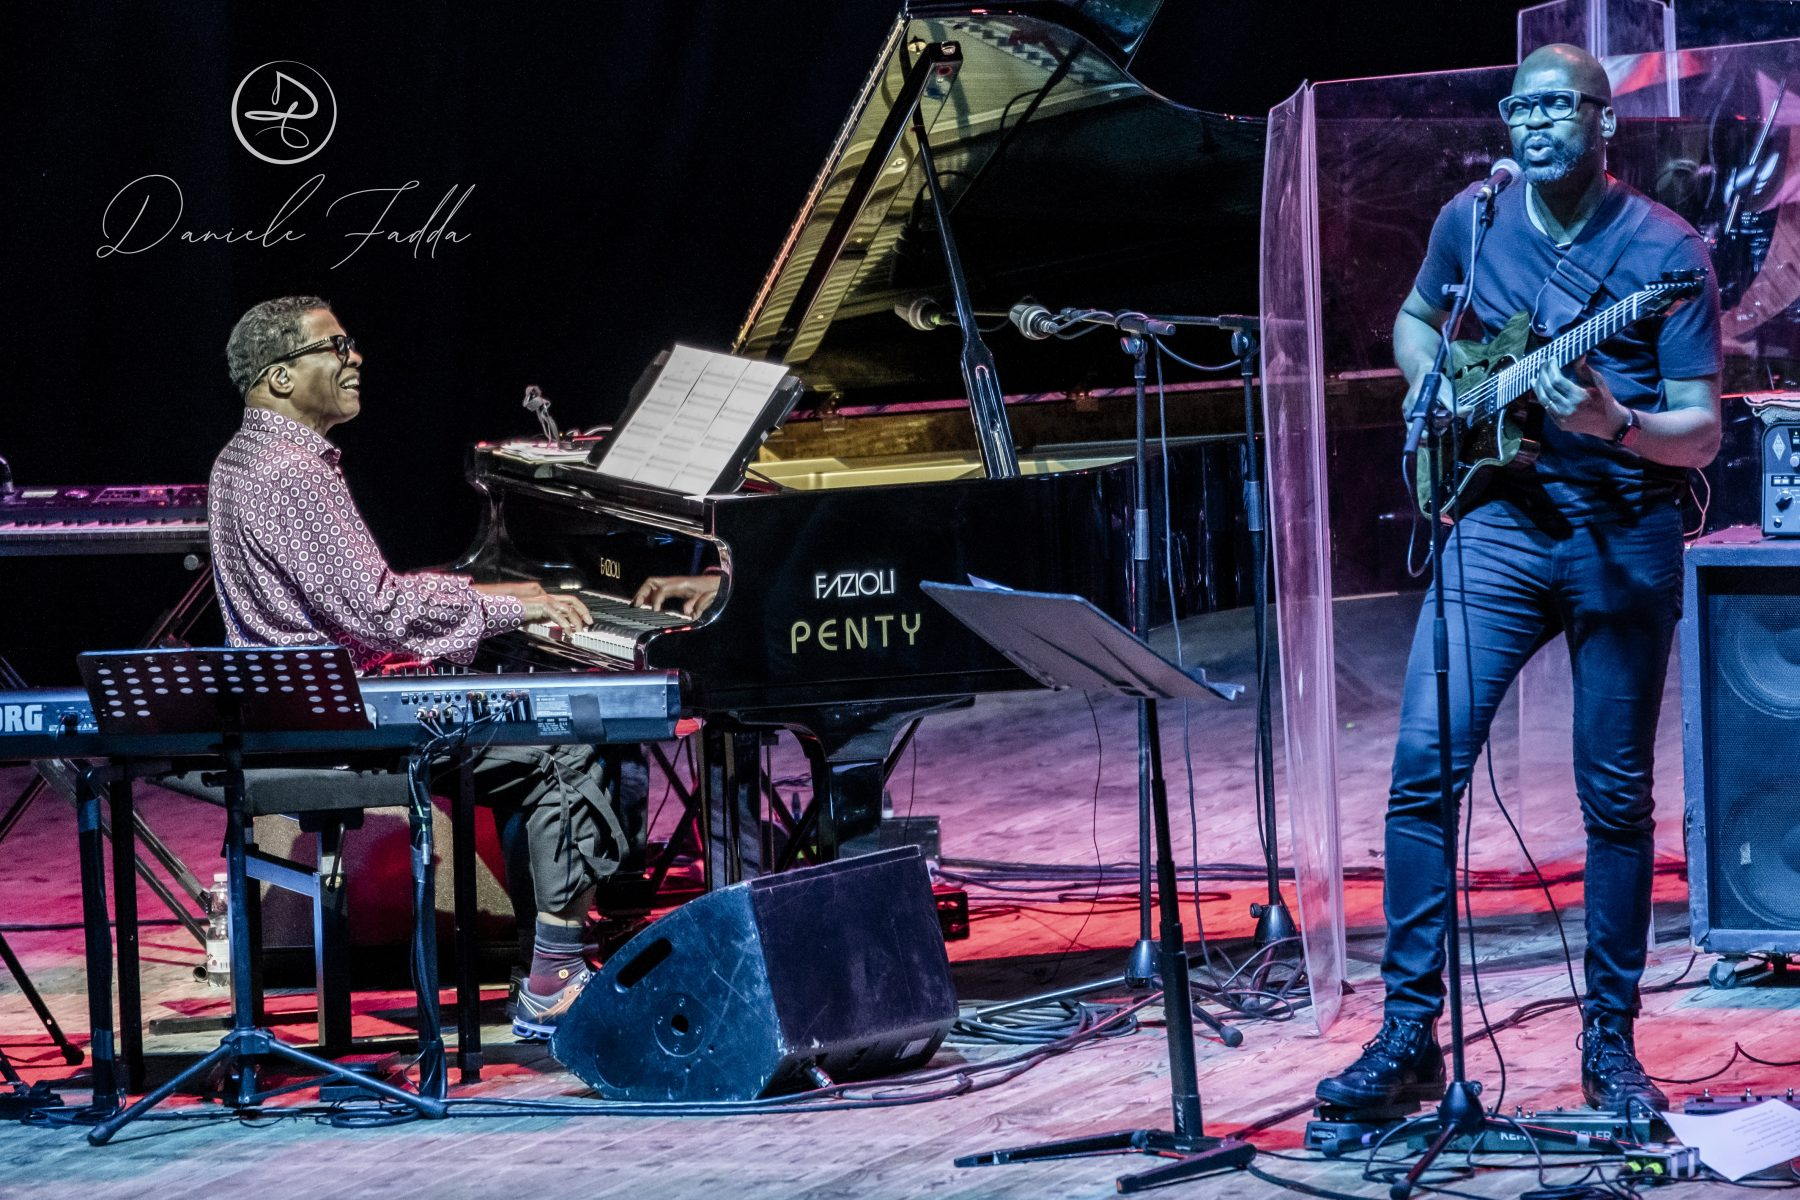 European Jazz Expo - Daniele Fadda - 2019 - Sa Scena Sarda